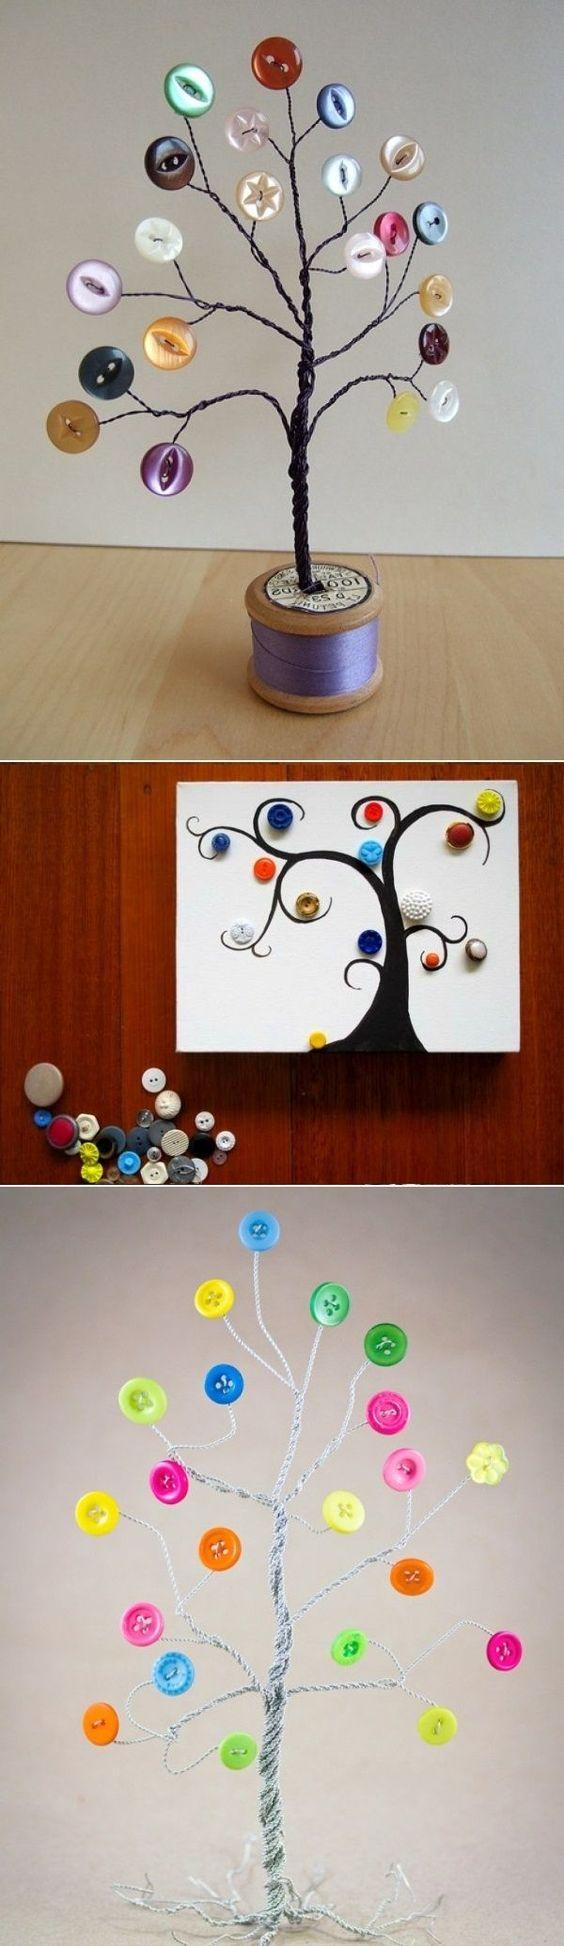 *DIY Button Tree - http://usefulforwomen.info/diy-button-tree/ #justforwomen #craft #DIY: